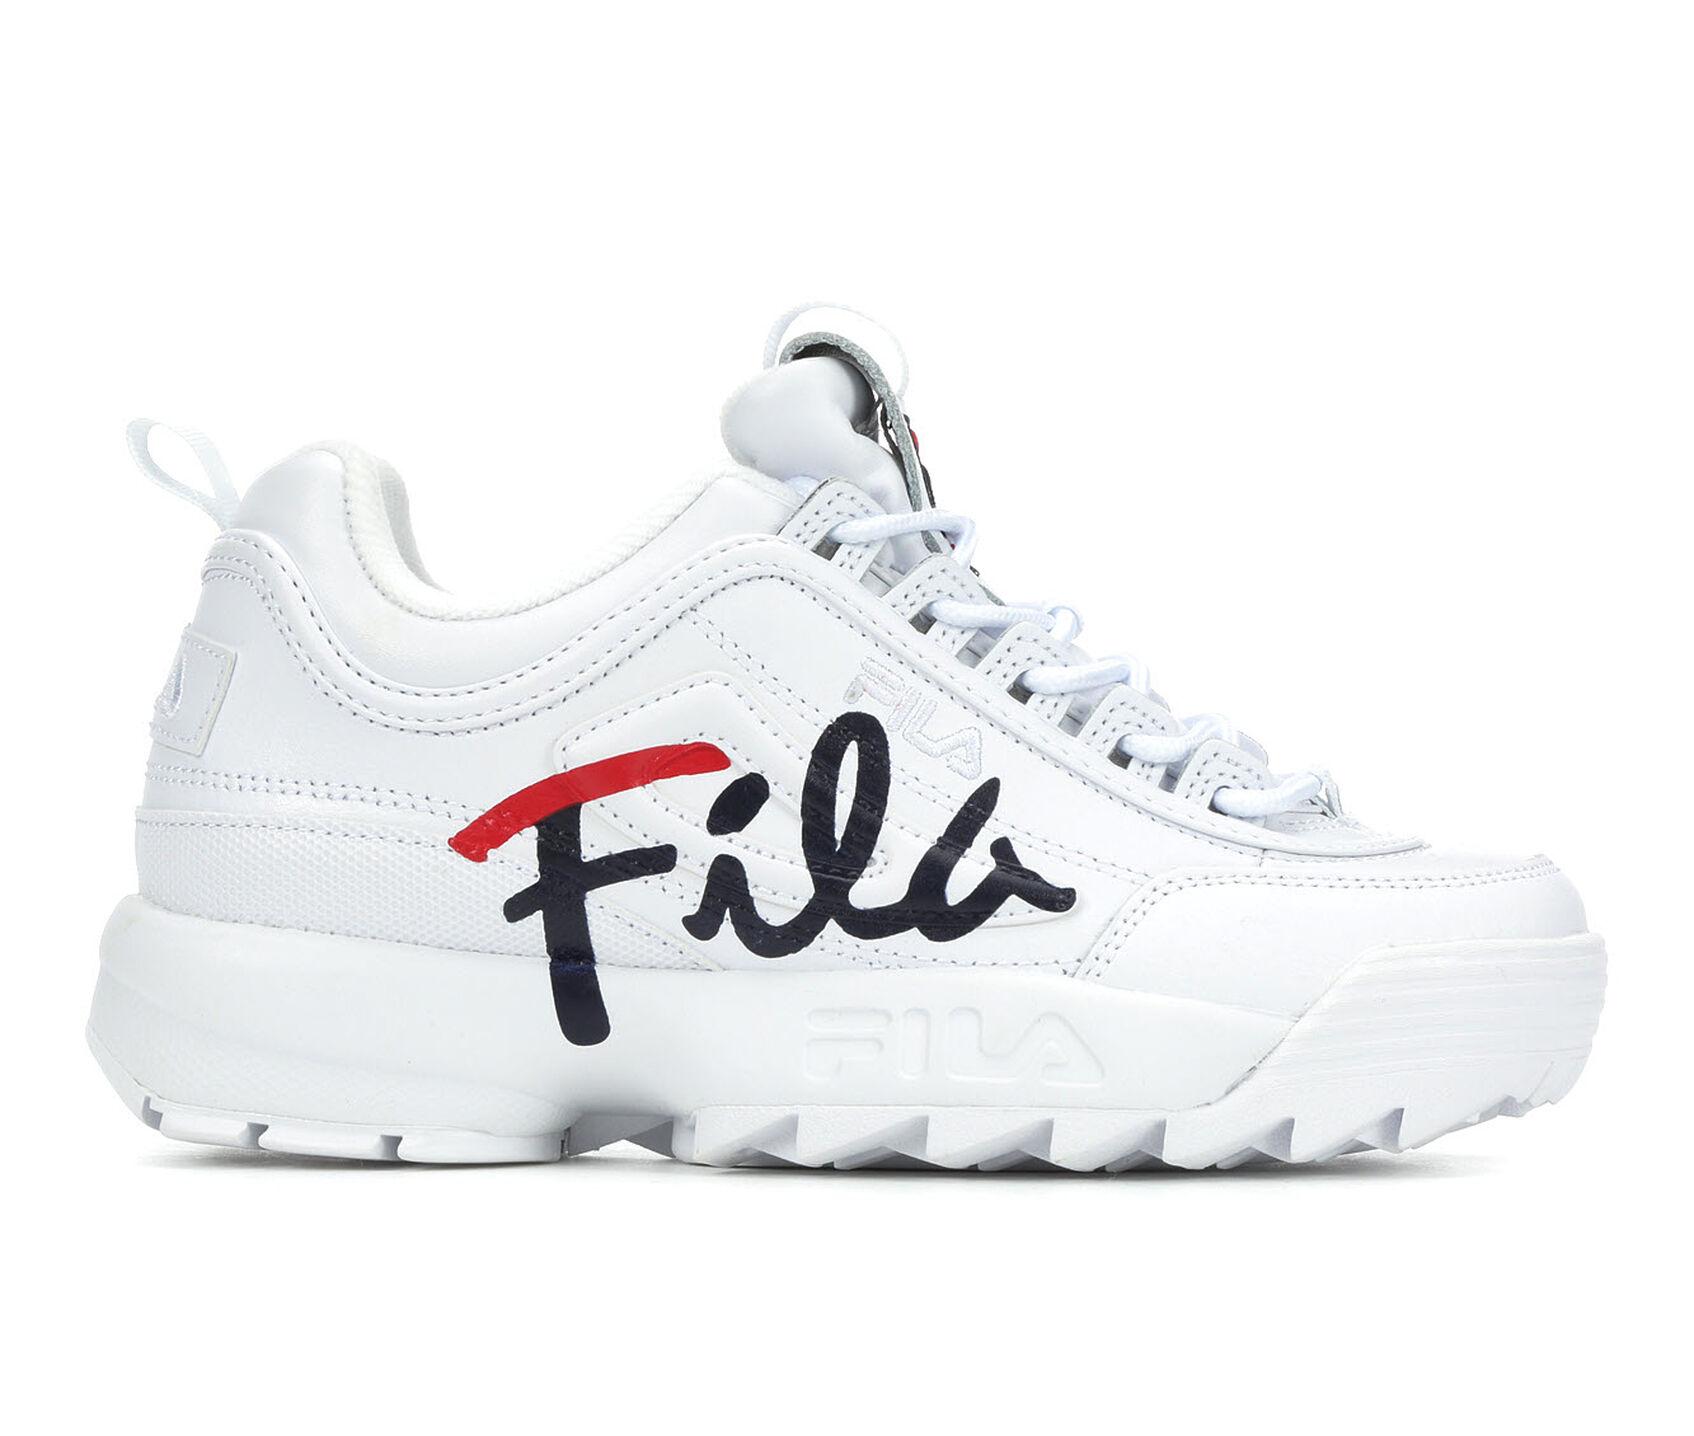 quality design 812e8 8d1e8 Women's Fila Disruptor II Script Sneakers